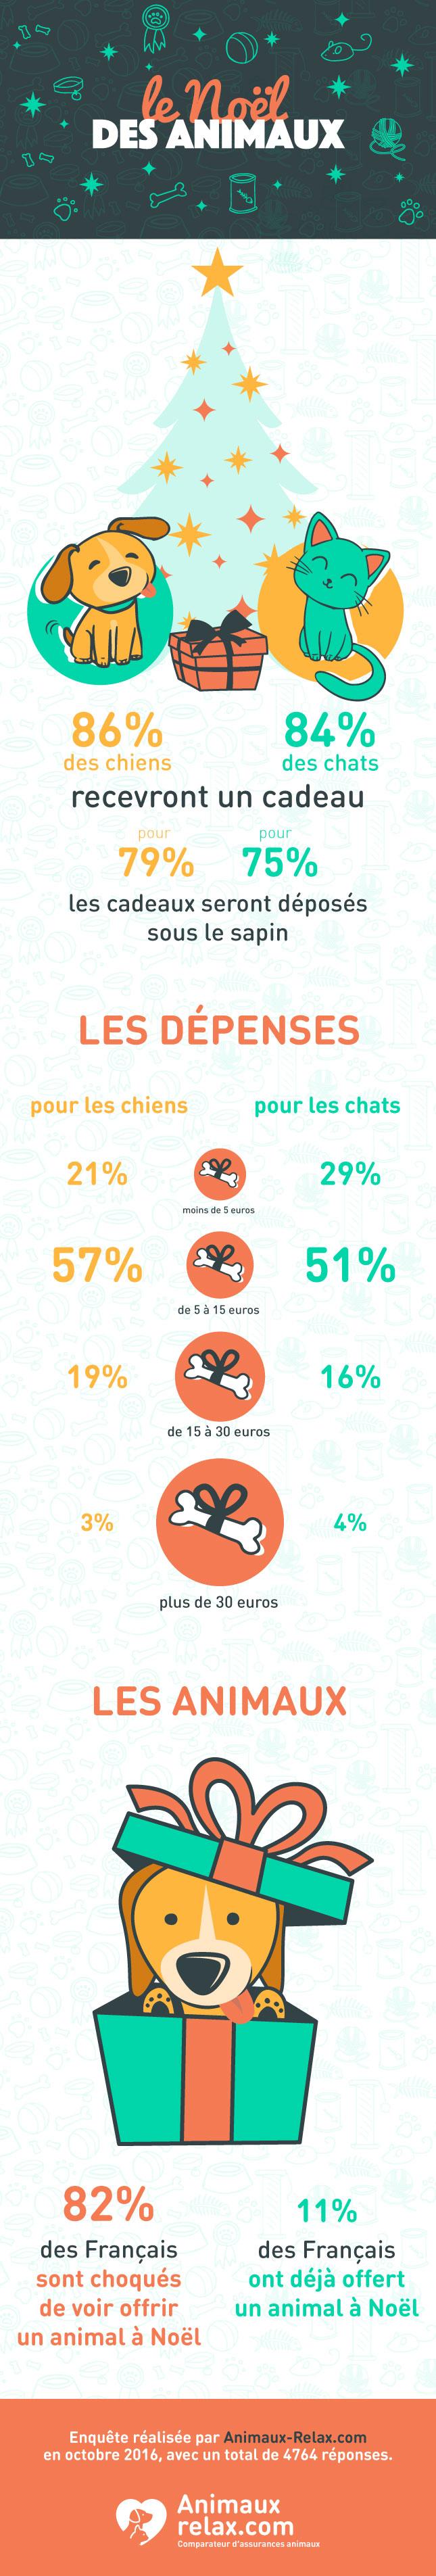 infographie noël des animaux